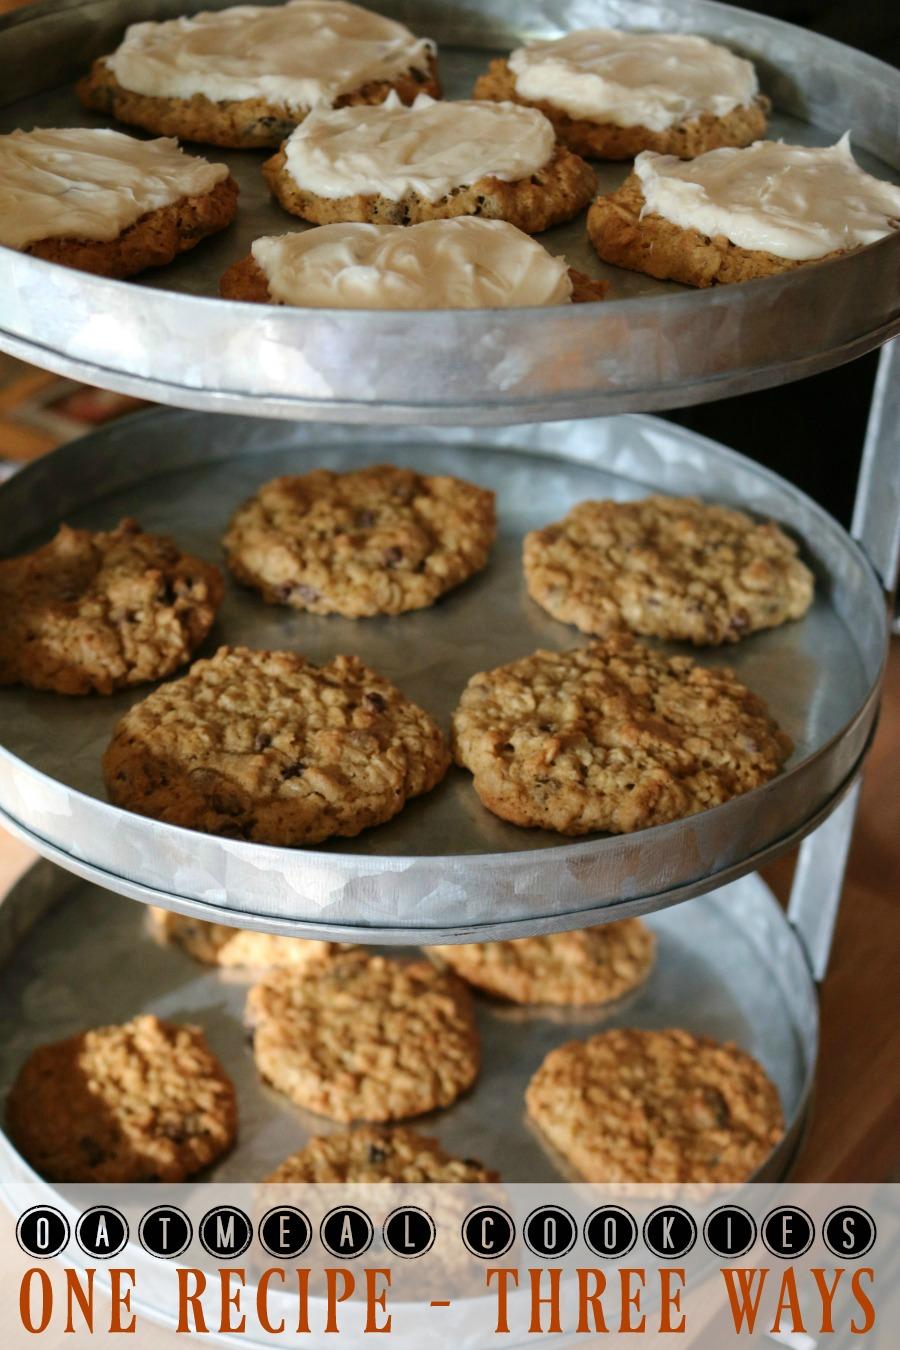 Oatmeal Cookies One Easy Recipe - Cookies Three Ways